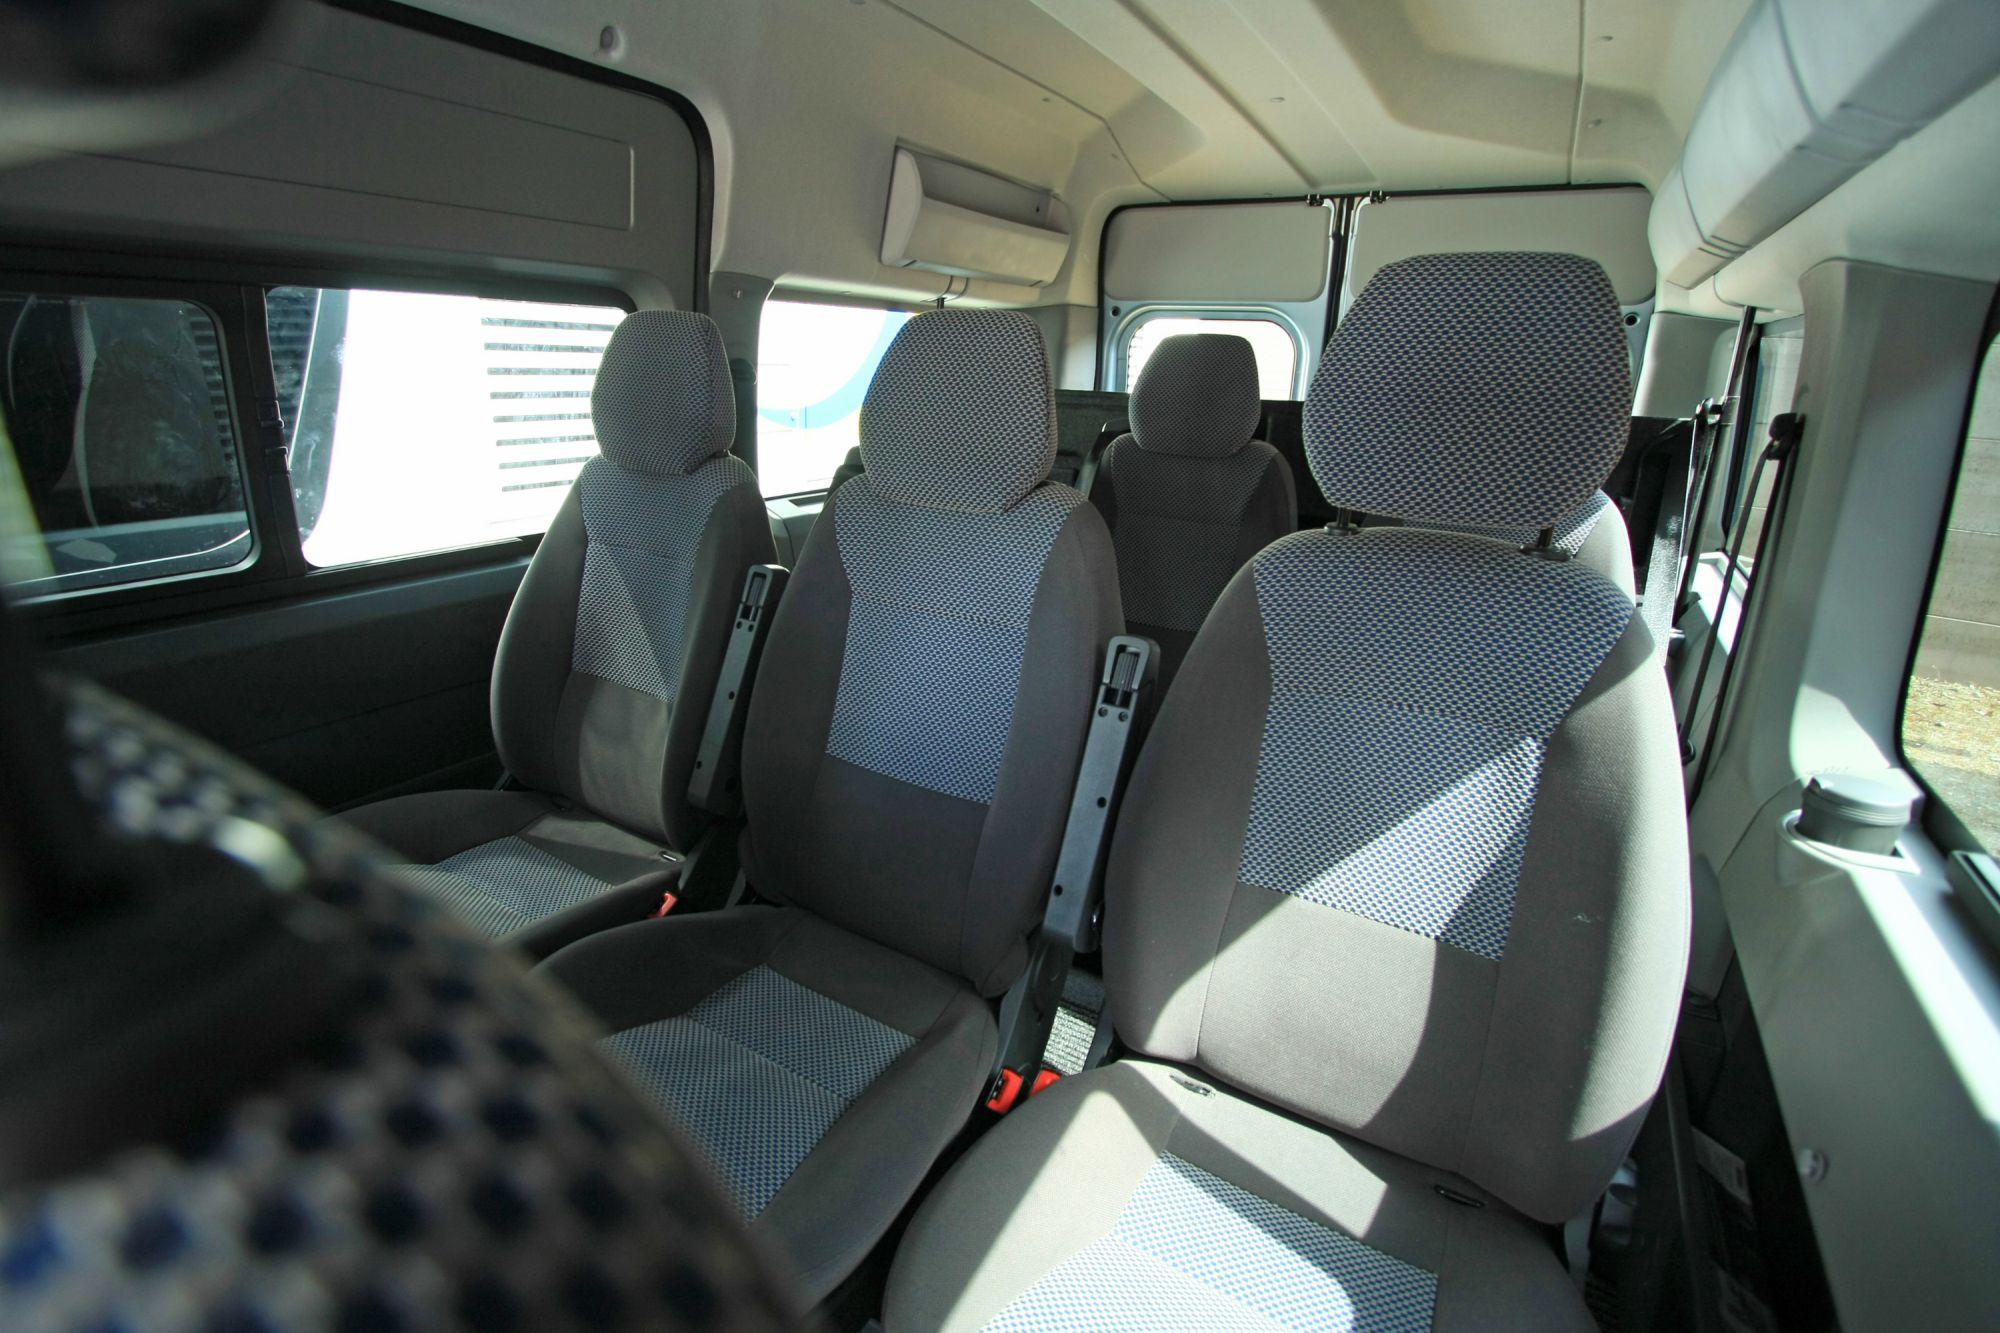 Citroen-mini-bus-(1)